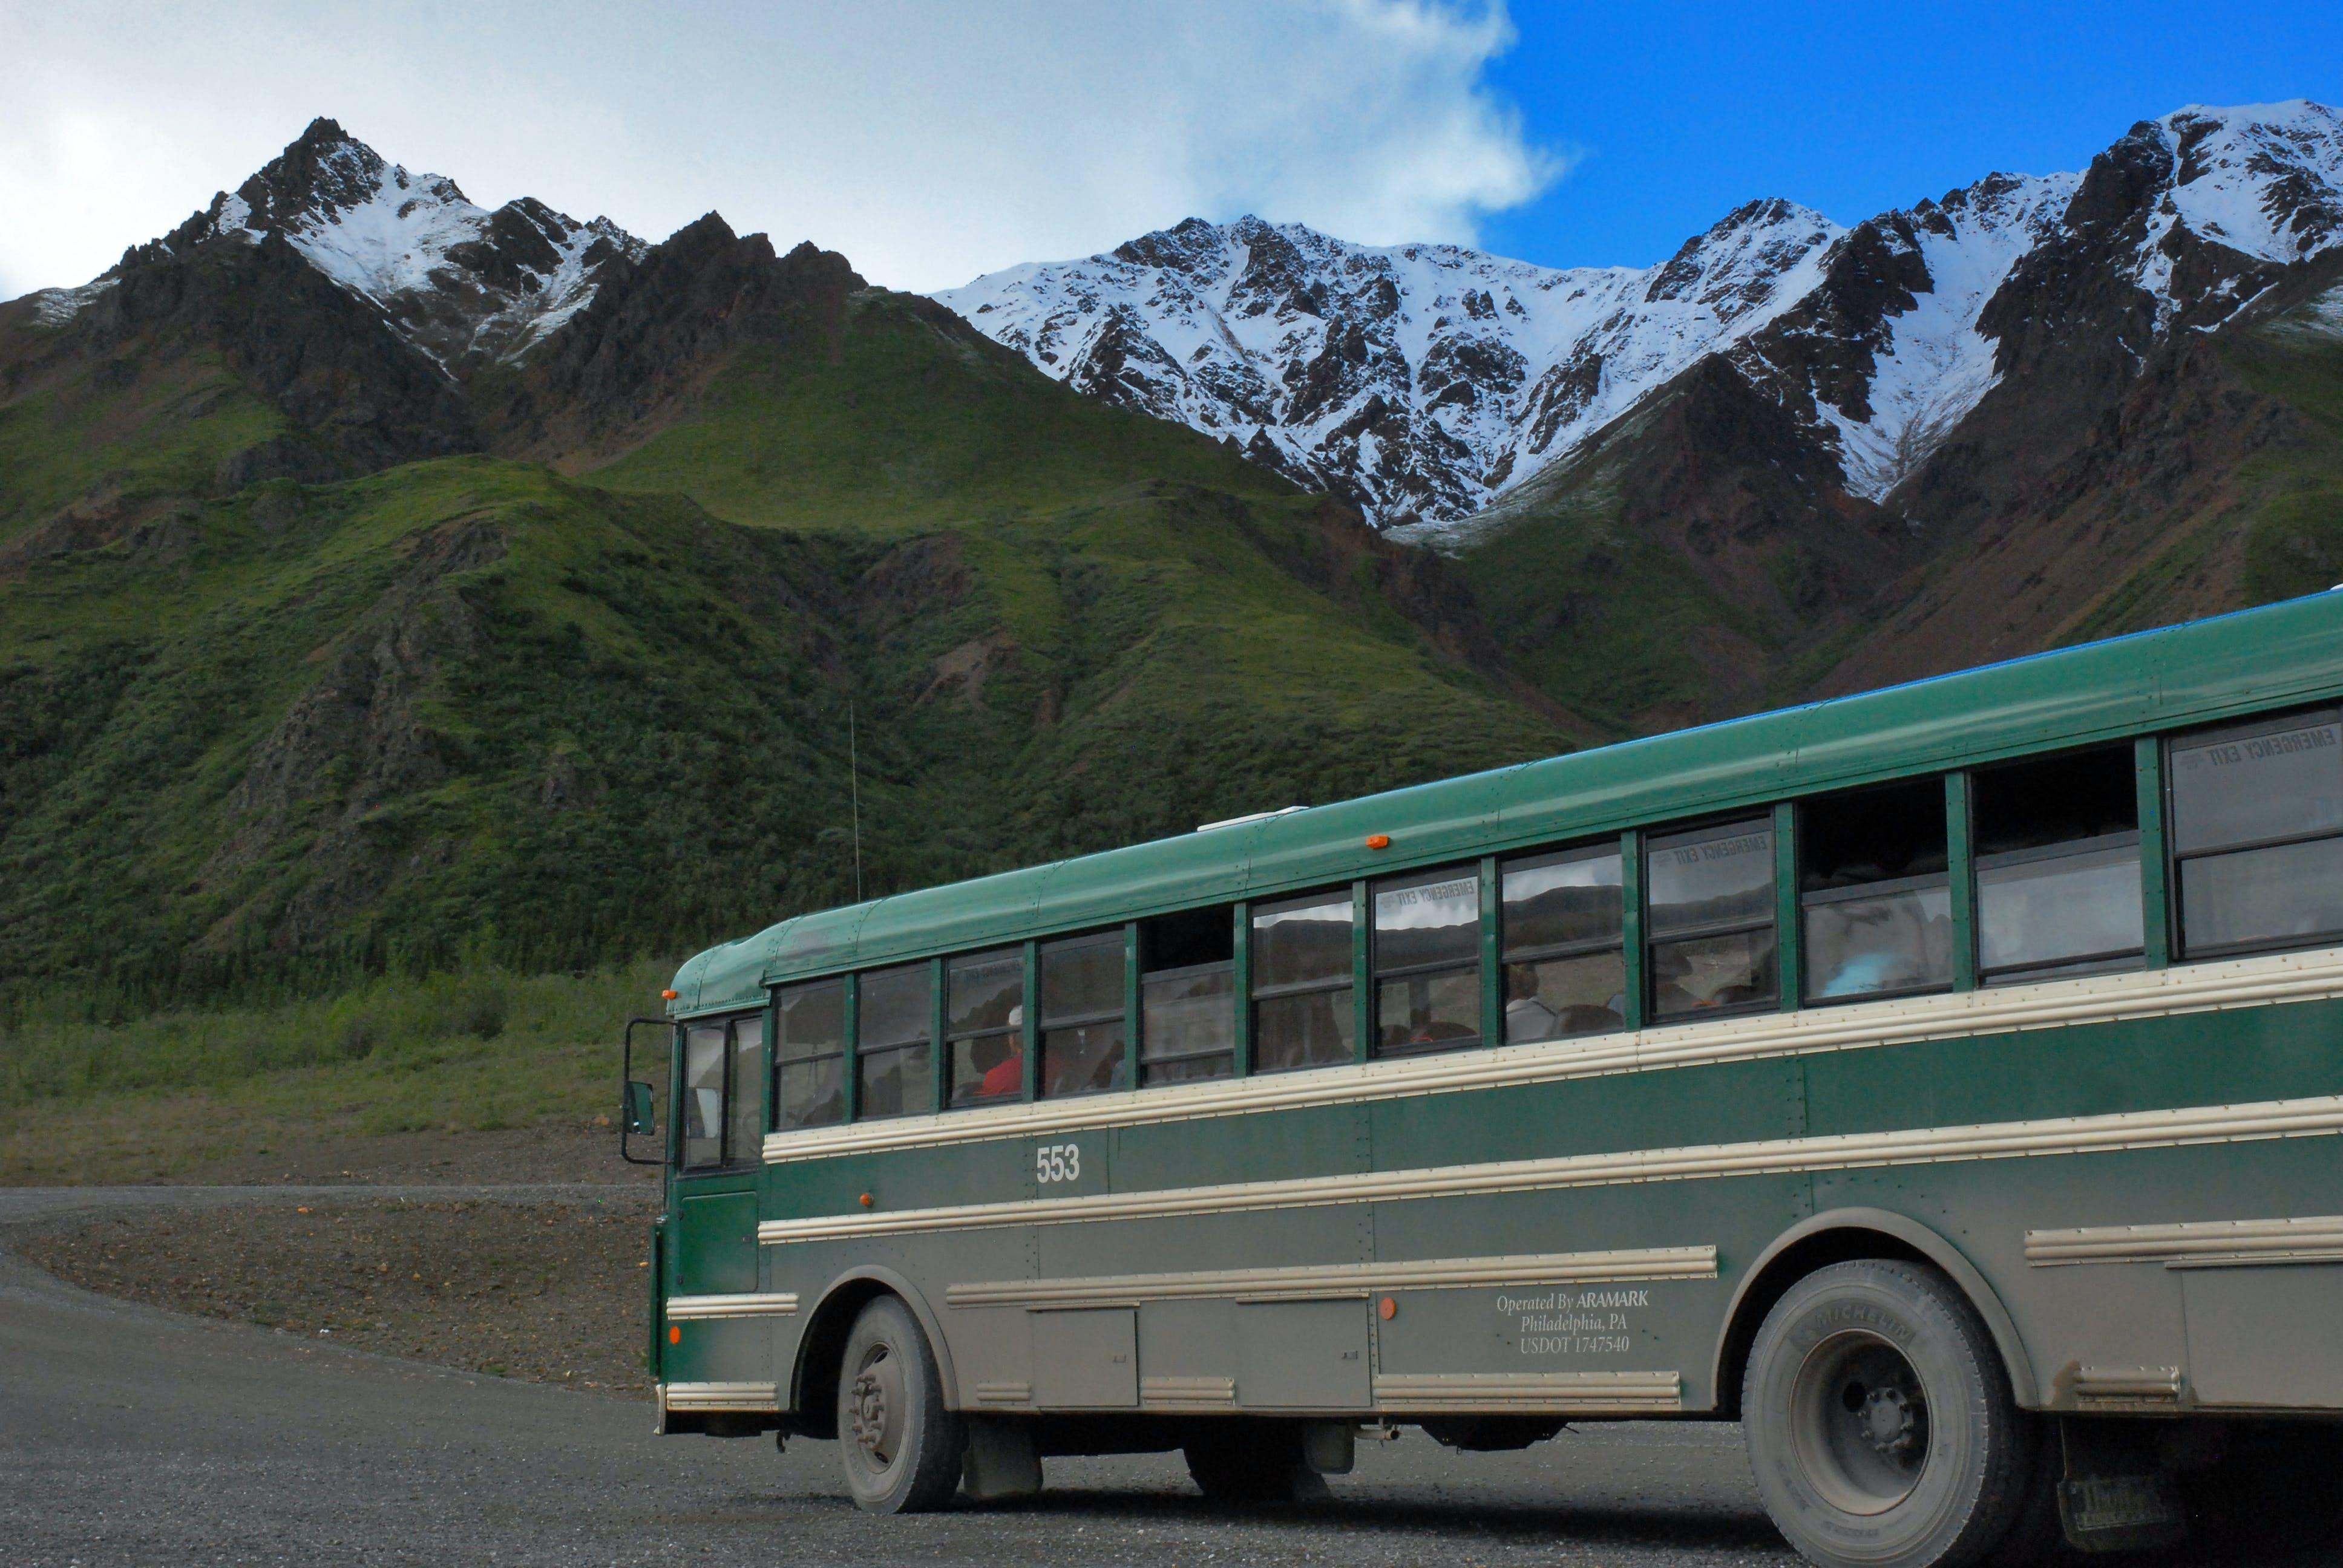 adventure, bus, mountain